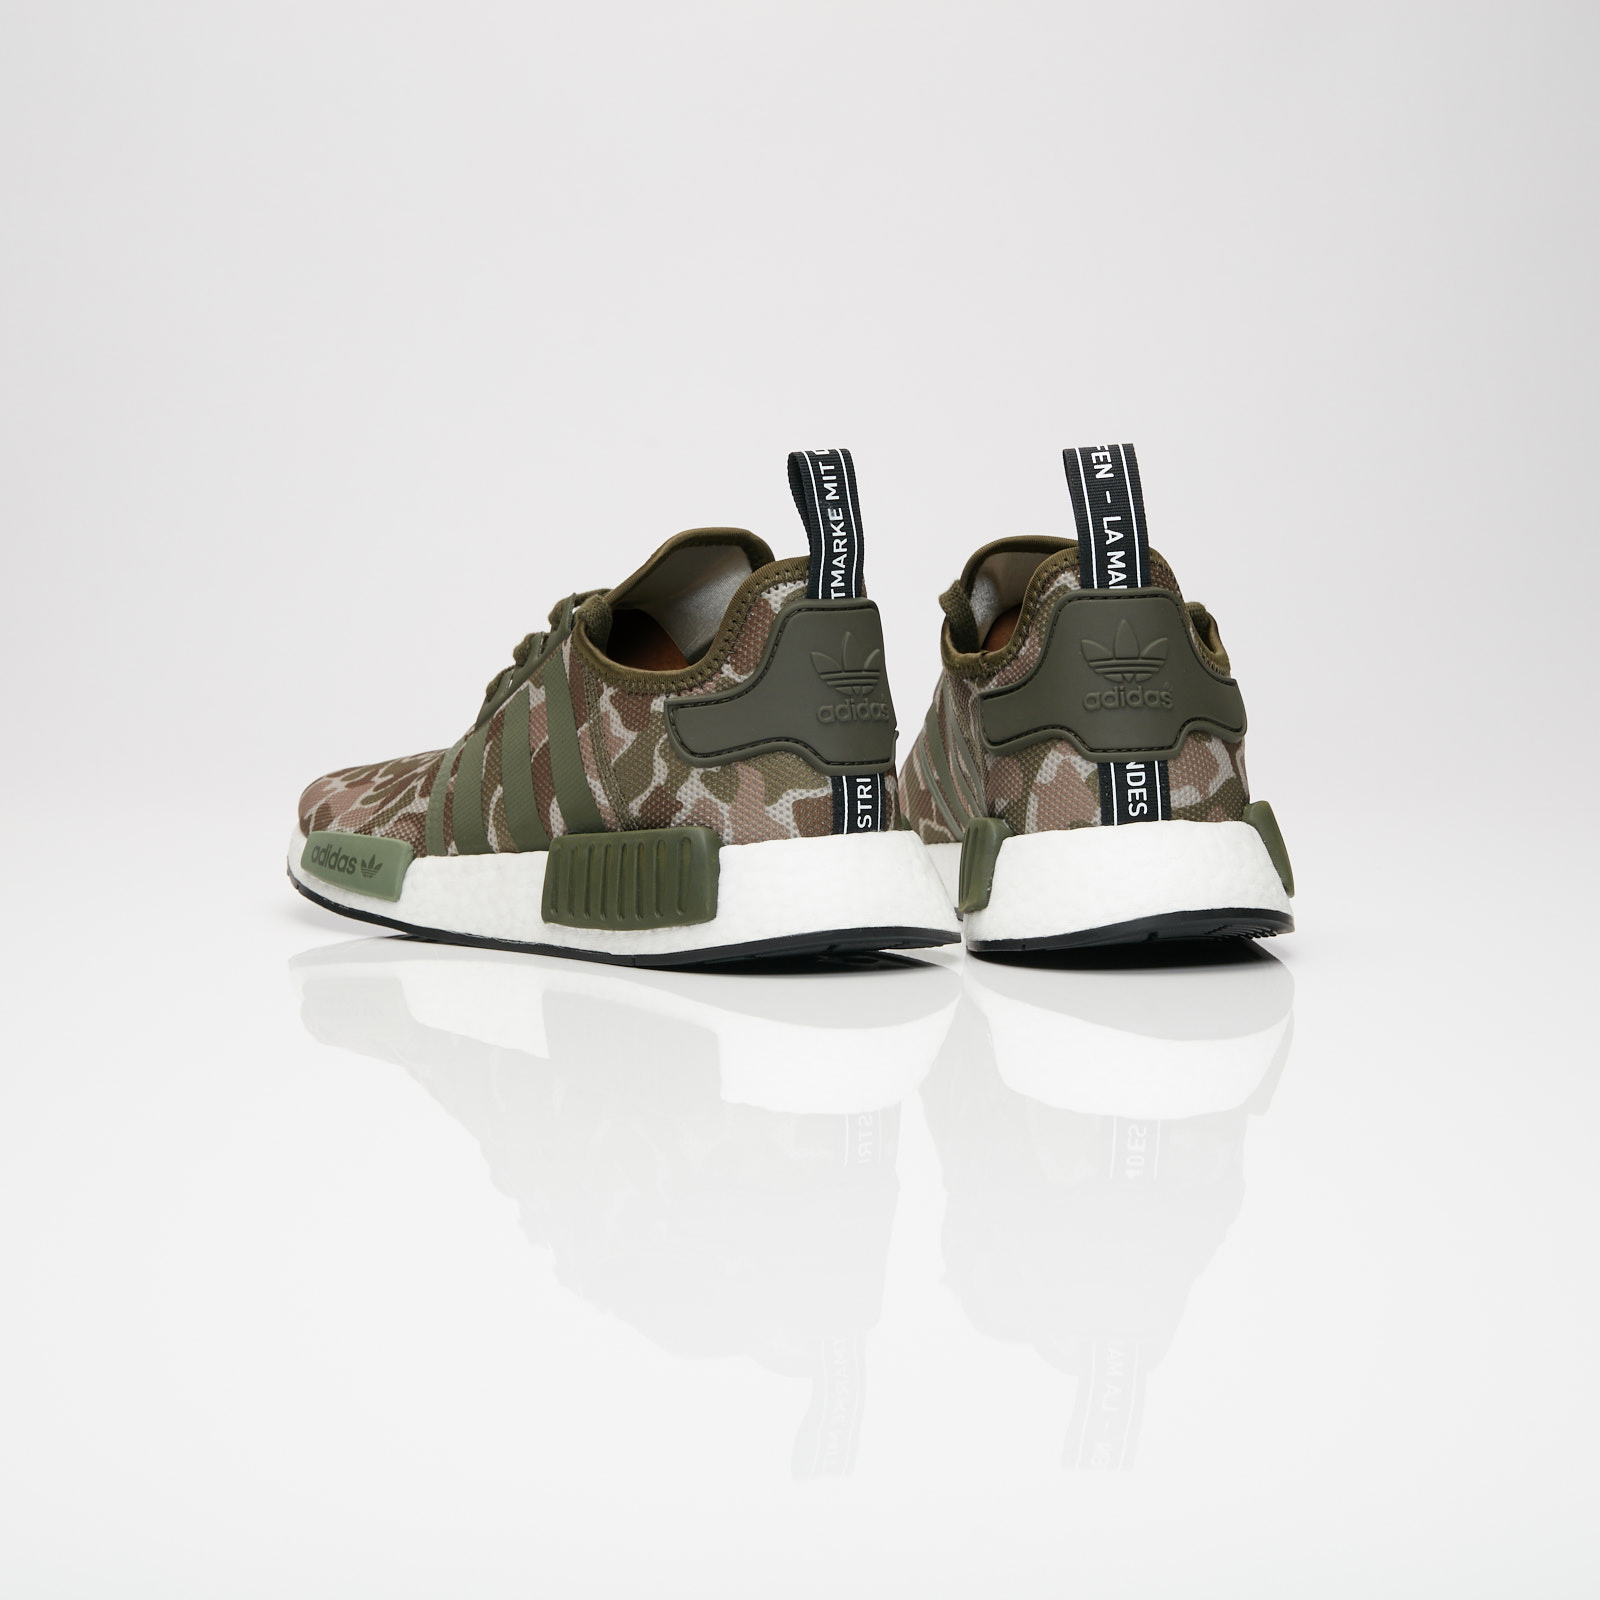 detailed look 66e6c 73c69 adidas NMD R1 - D96617 - Sneakersnstuff   sneakers   streetwear online  since 1999